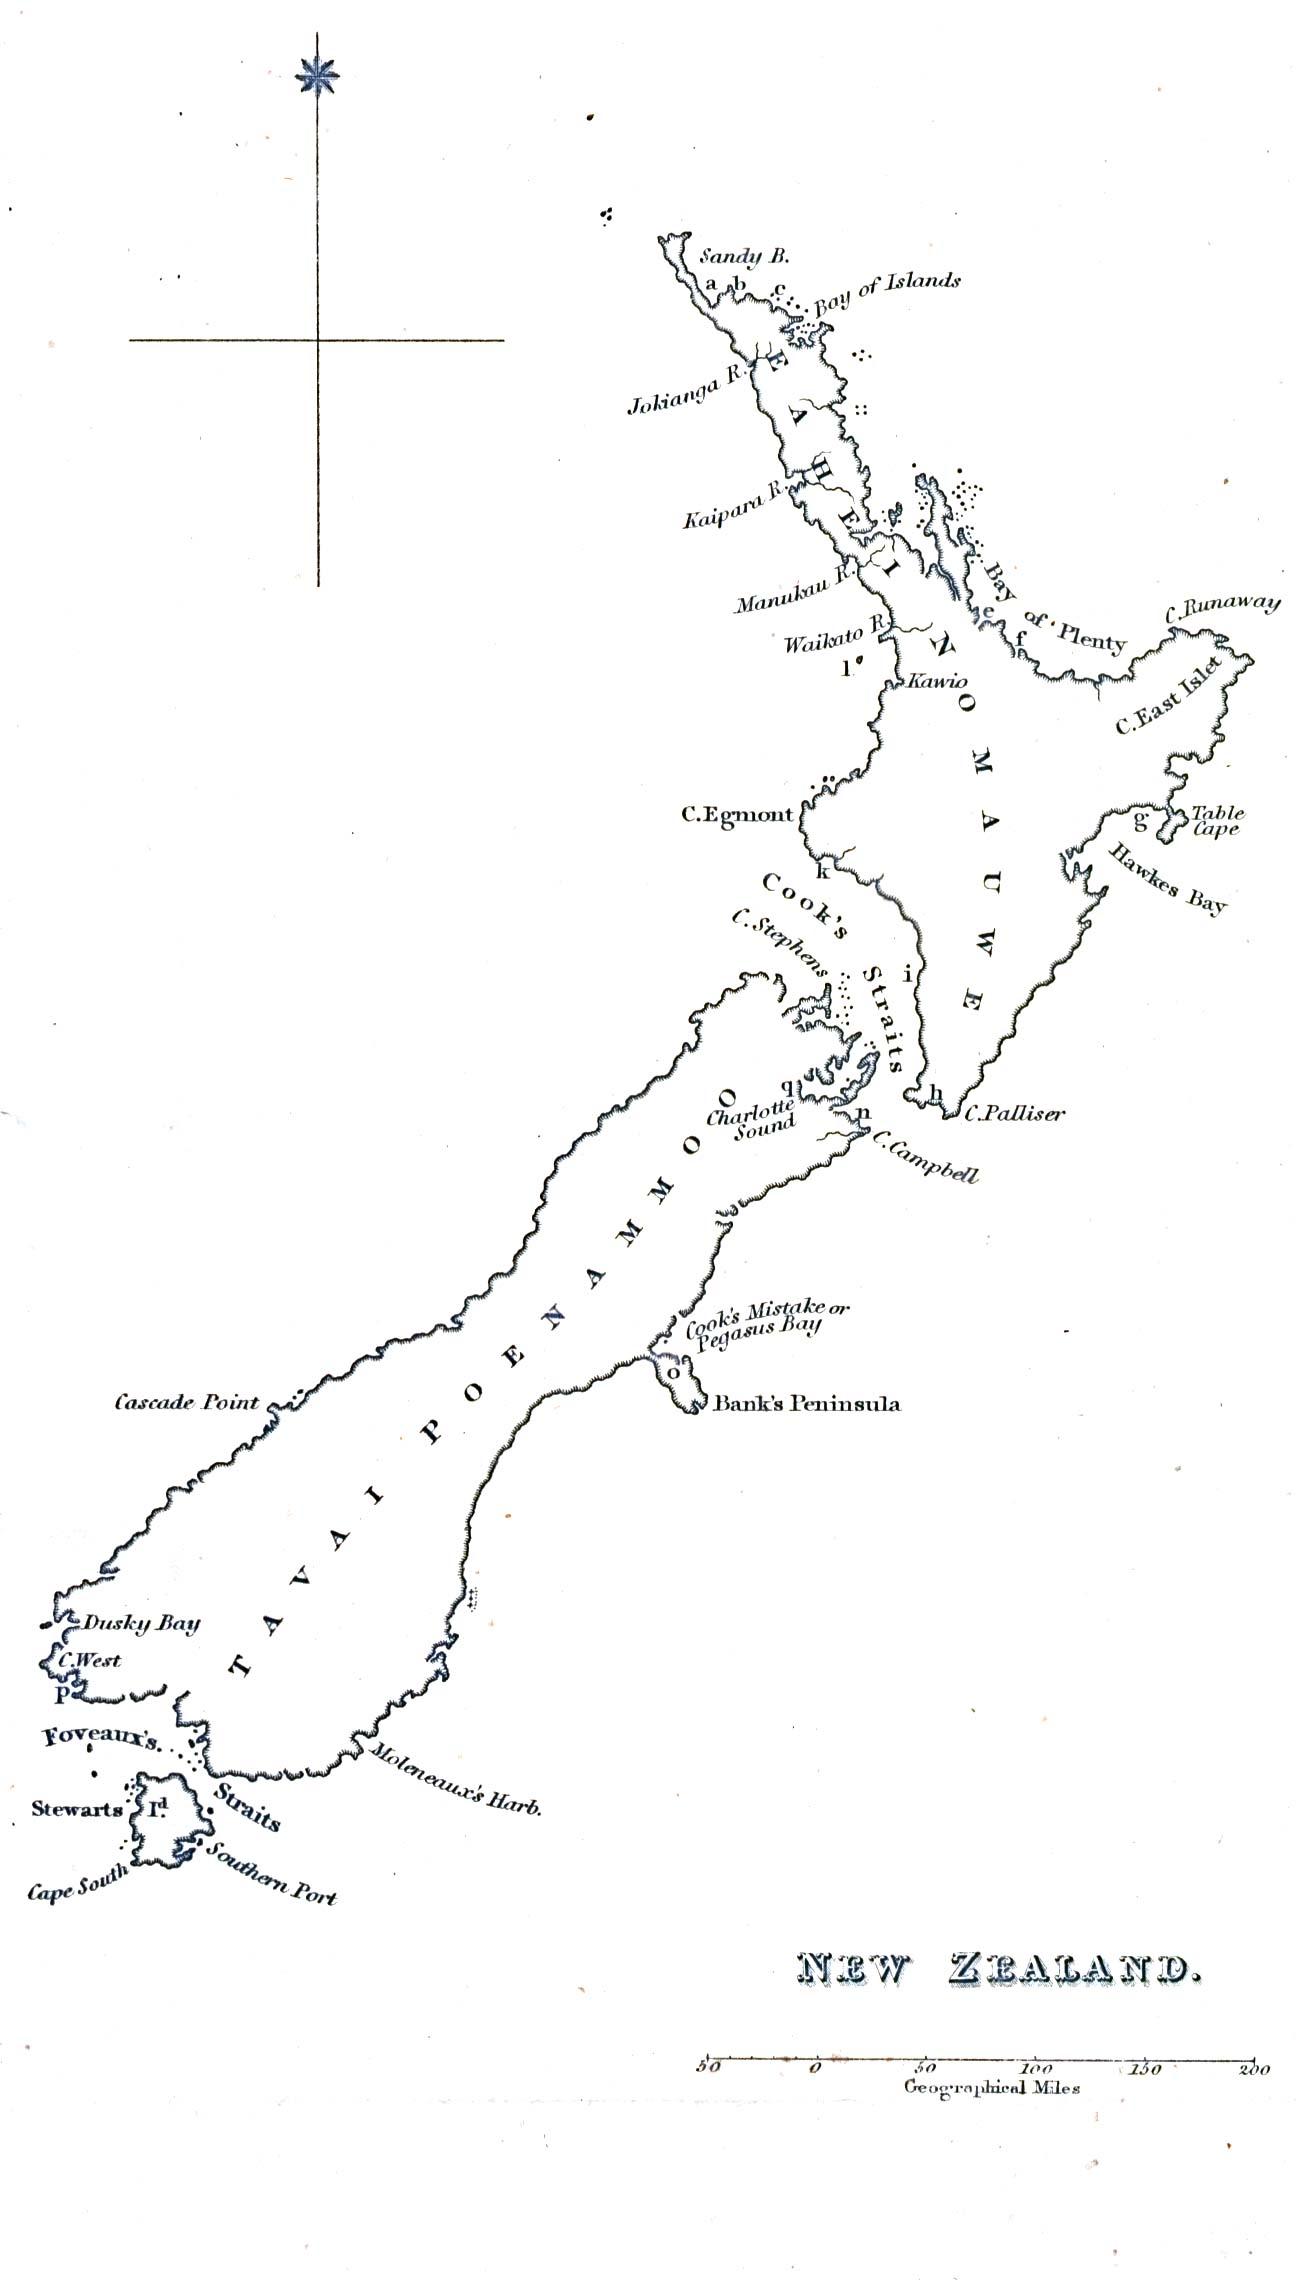 WWW-VL: History Index: New Zealand History: Maori, Christ